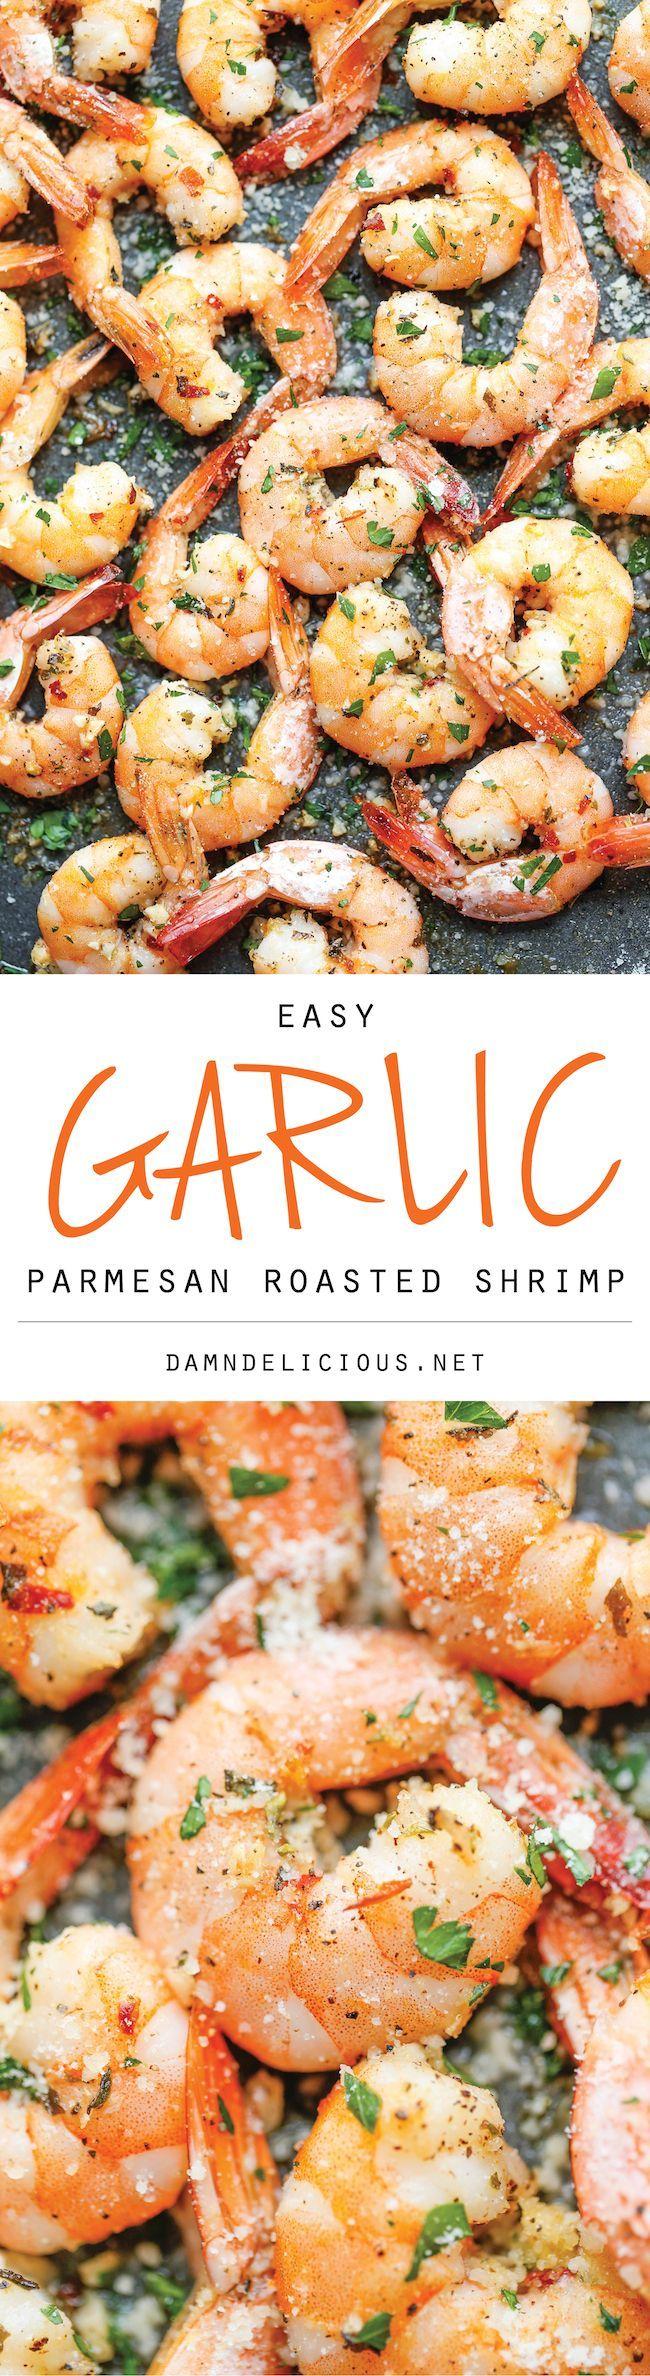 Garlic Parmesan Roasted Shrimp -  Easy and just 5 minutes prep #shrimp #garlic #recipe